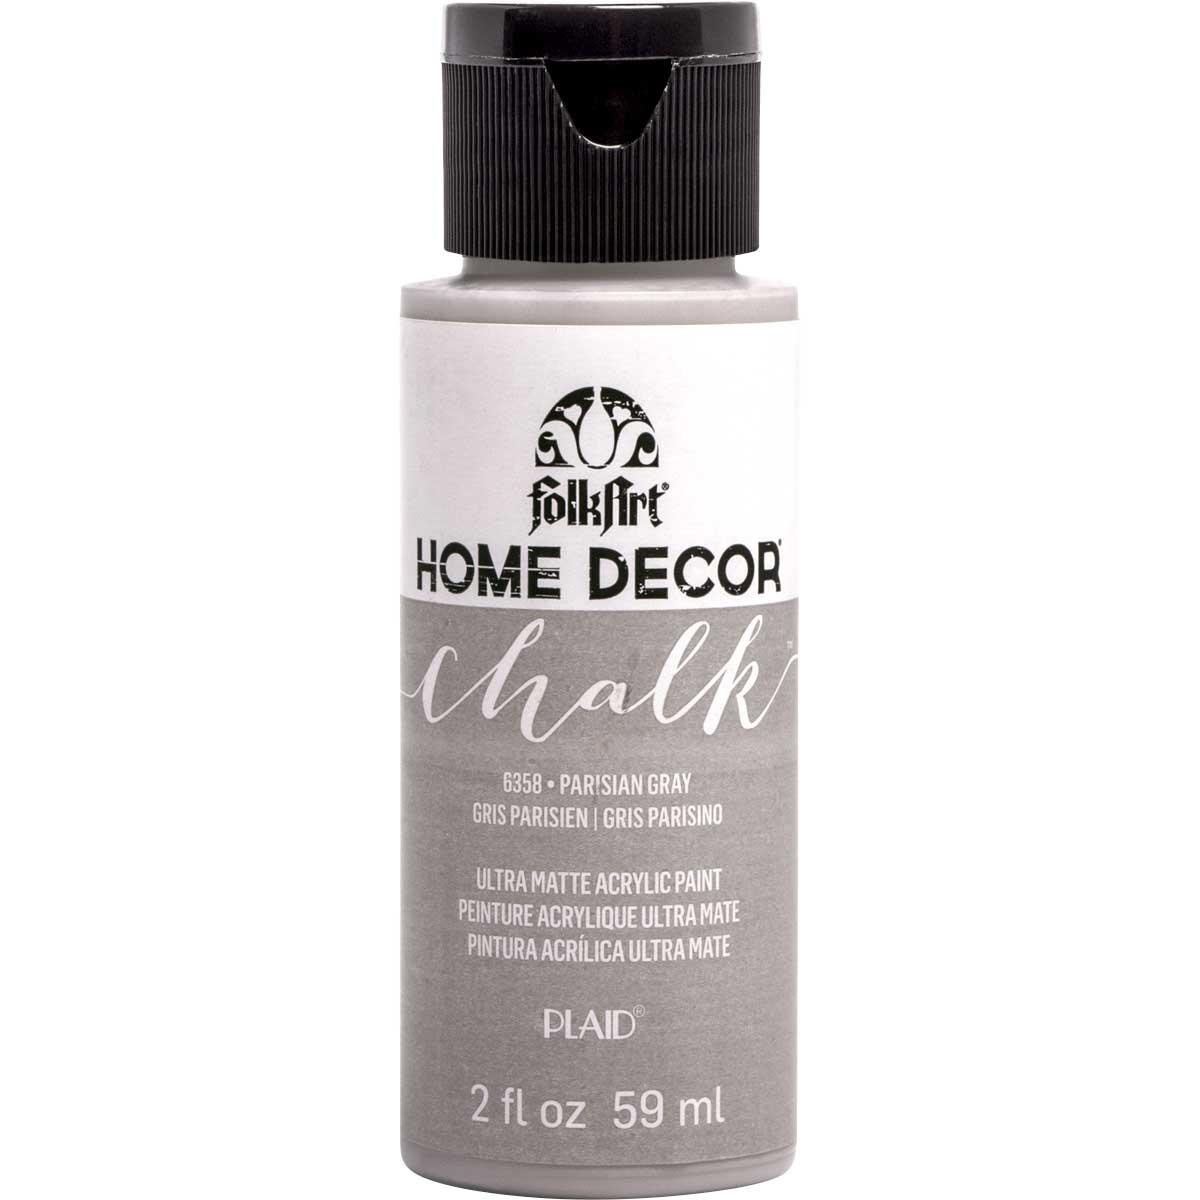 FolkArt ® Home Decor™ Chalk - Parisian Gray, 2 oz.